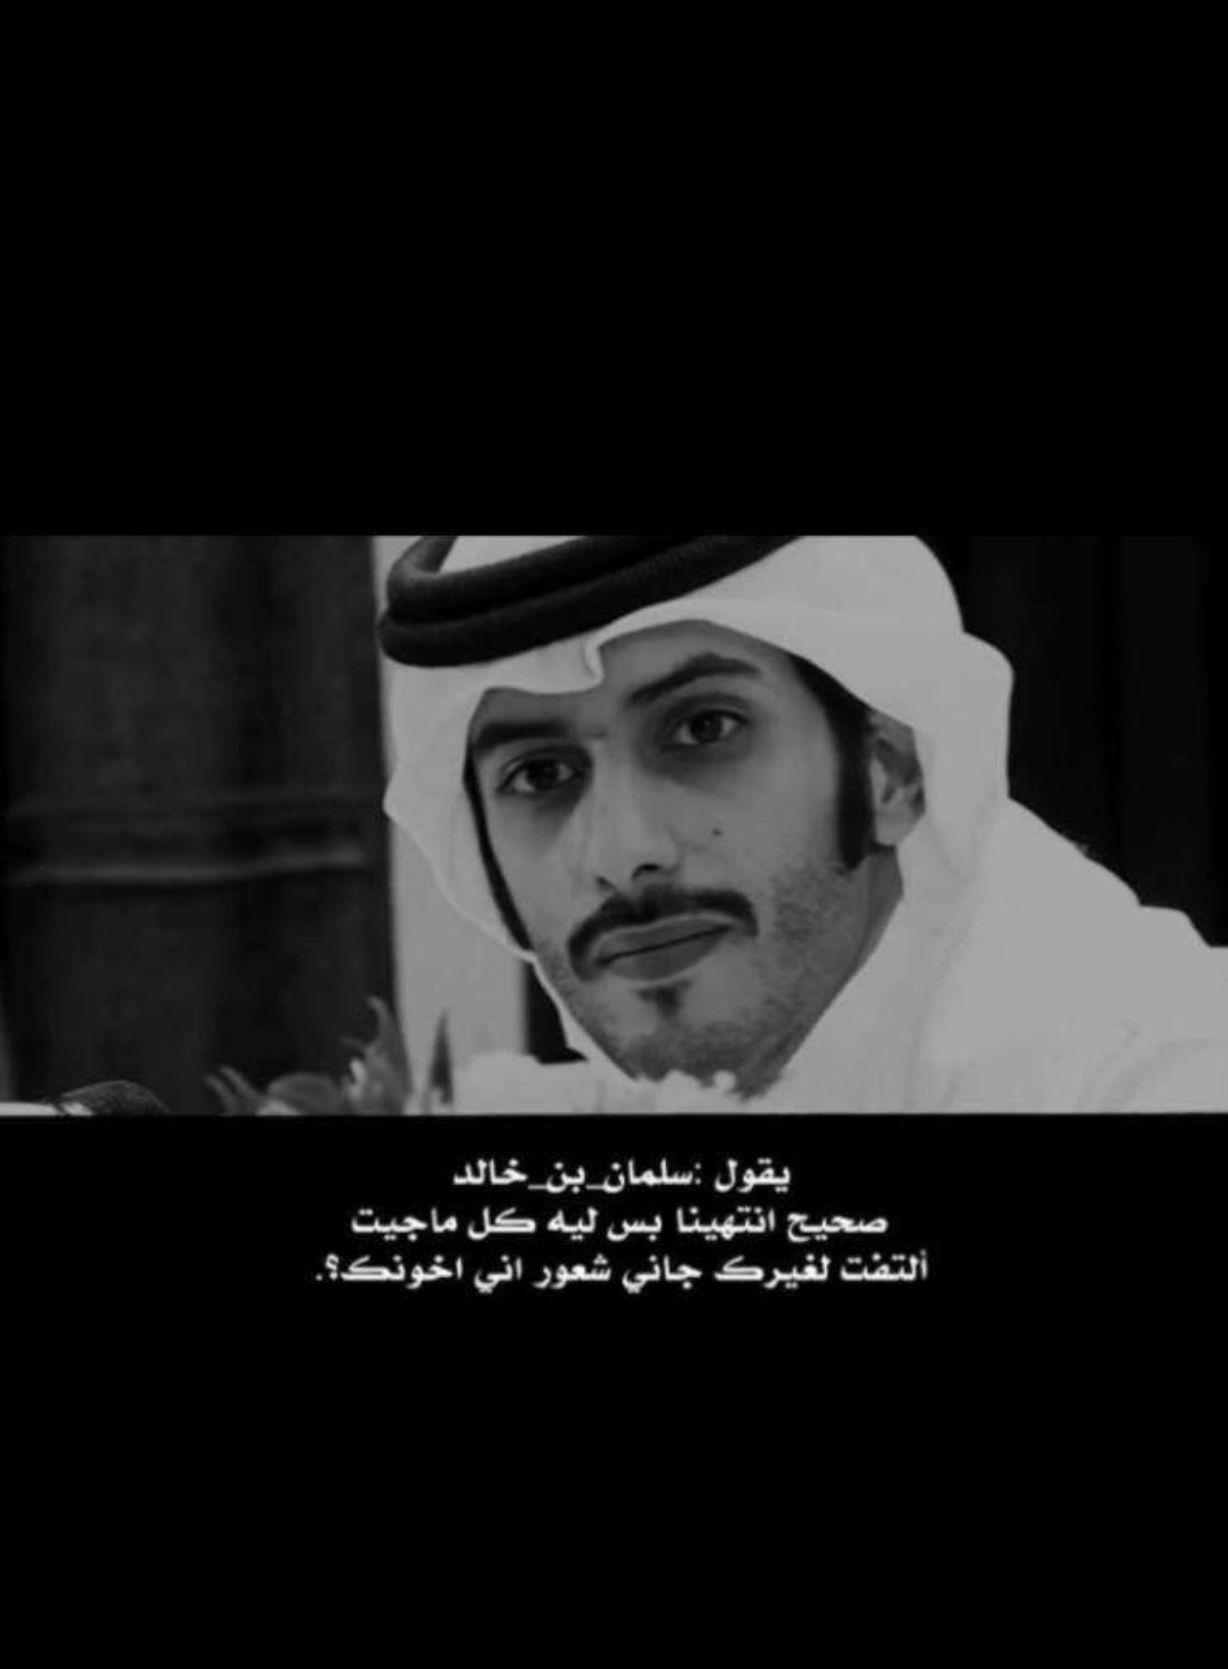 Pin By Re0o0ry ه م س ات ع اب ر ة On مشاعر Feelings Love Quotes For Wedding Beautiful Quran Quotes Short Quotes Love